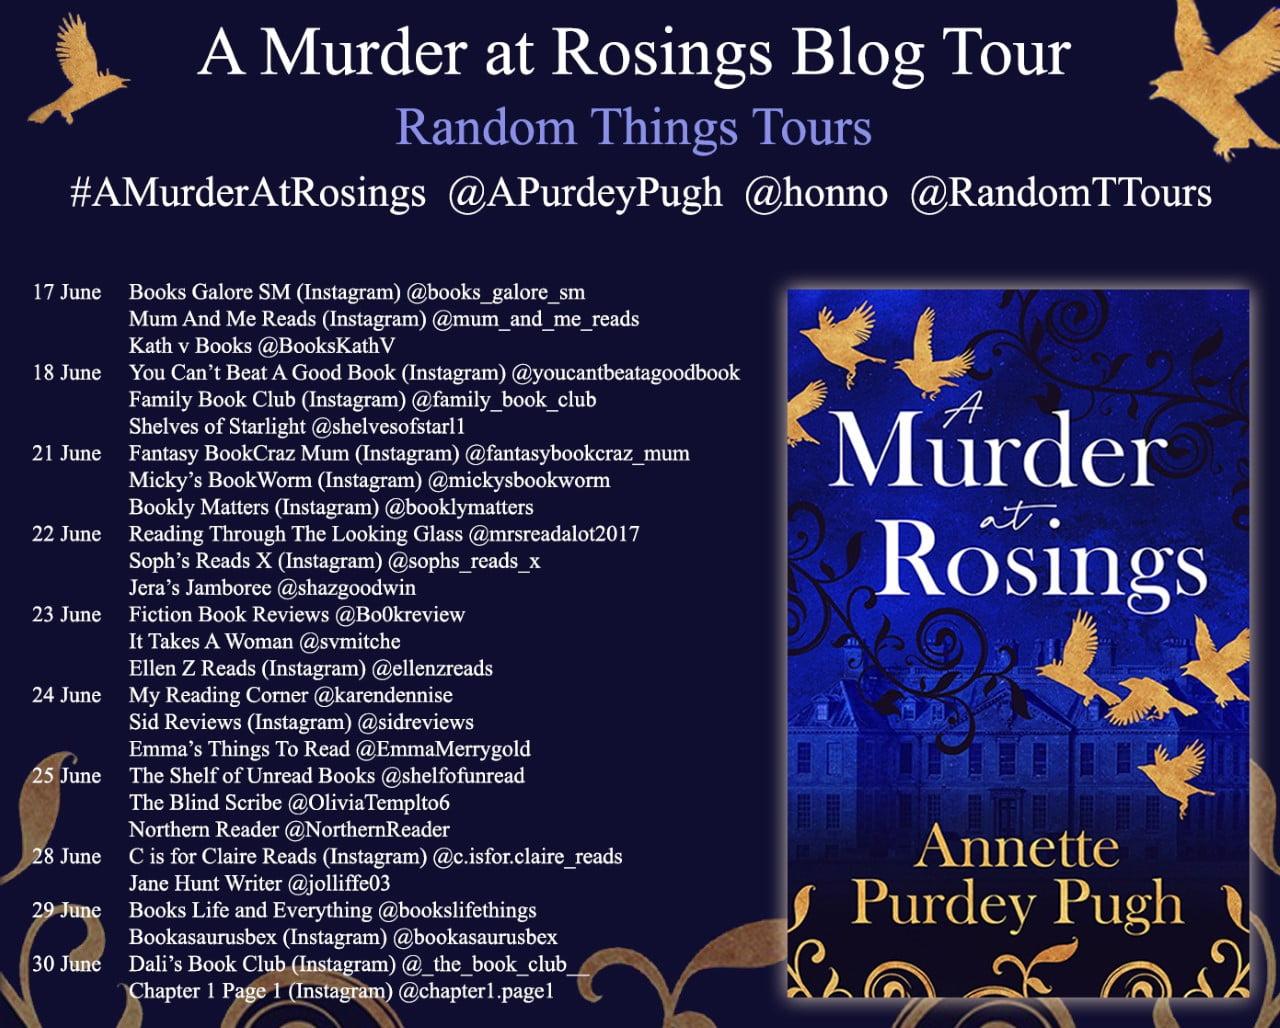 Murder at Rosings – Annette Purdey Pugh